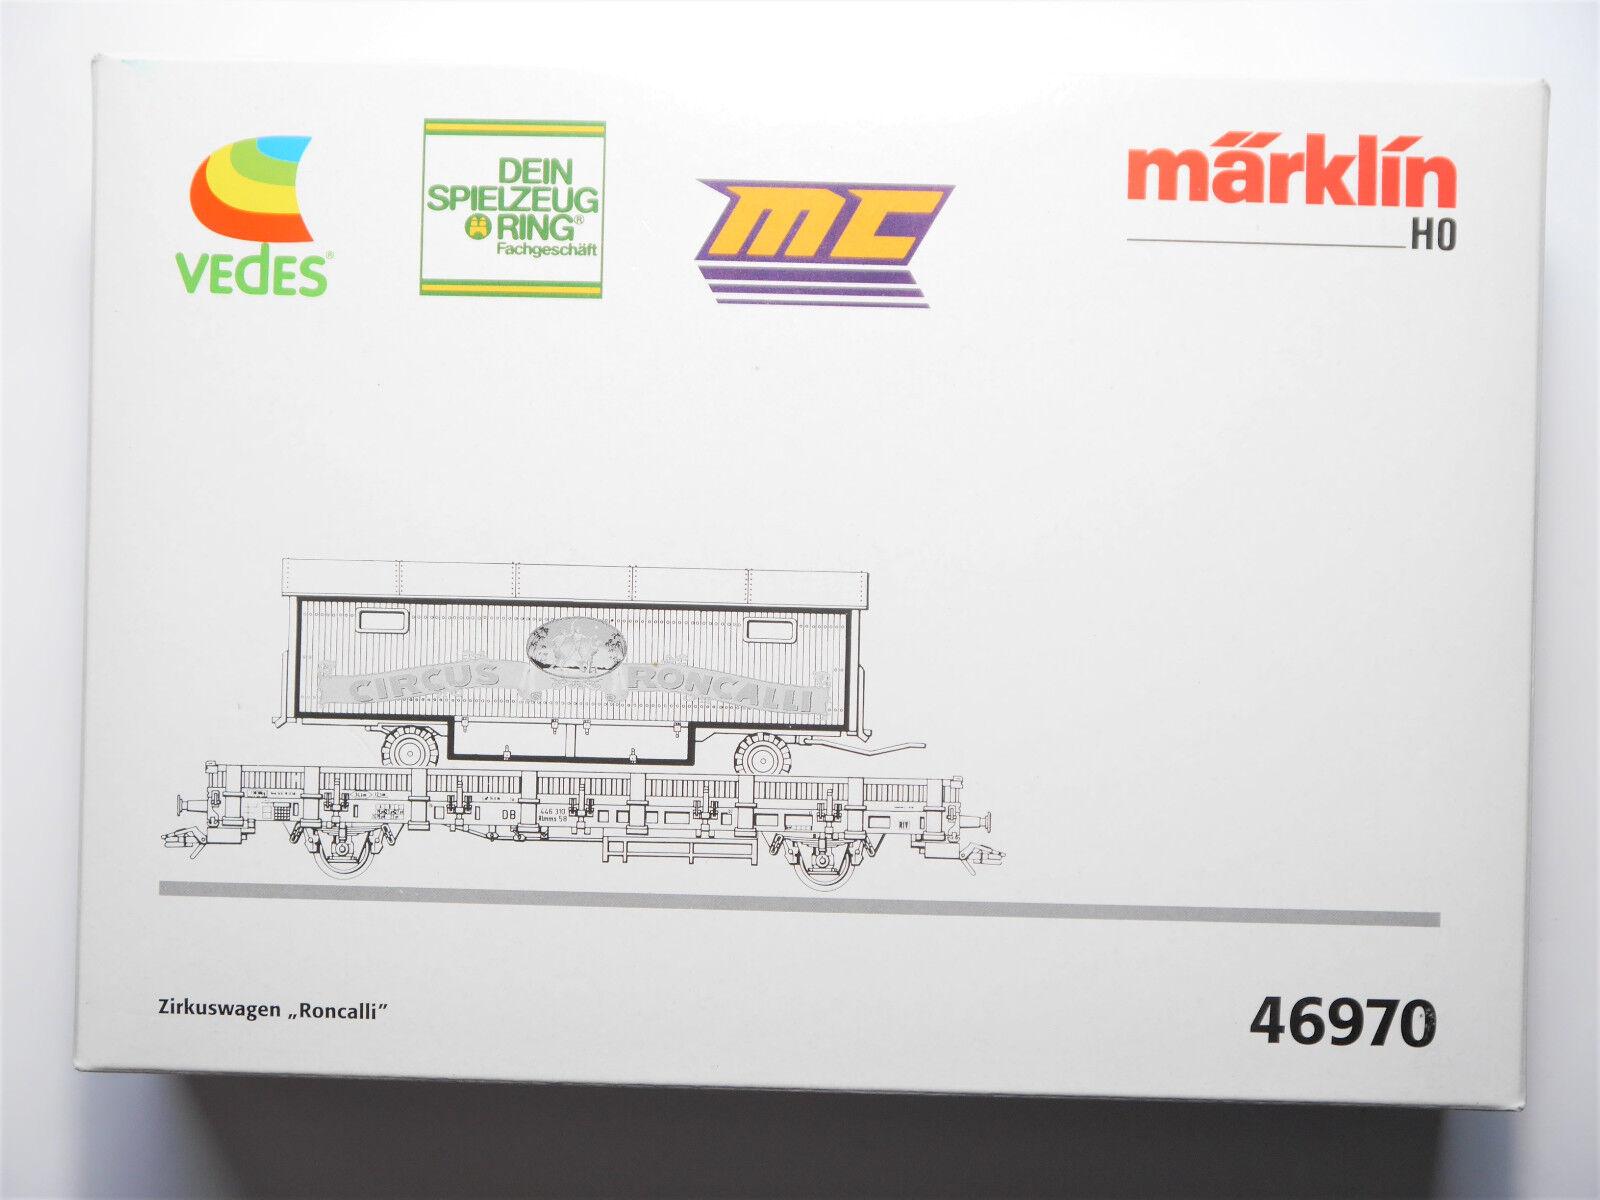 Carri merci Circus Circus CAR Roncalli,   Marklin  46970 in 1:87 h0 Boxed